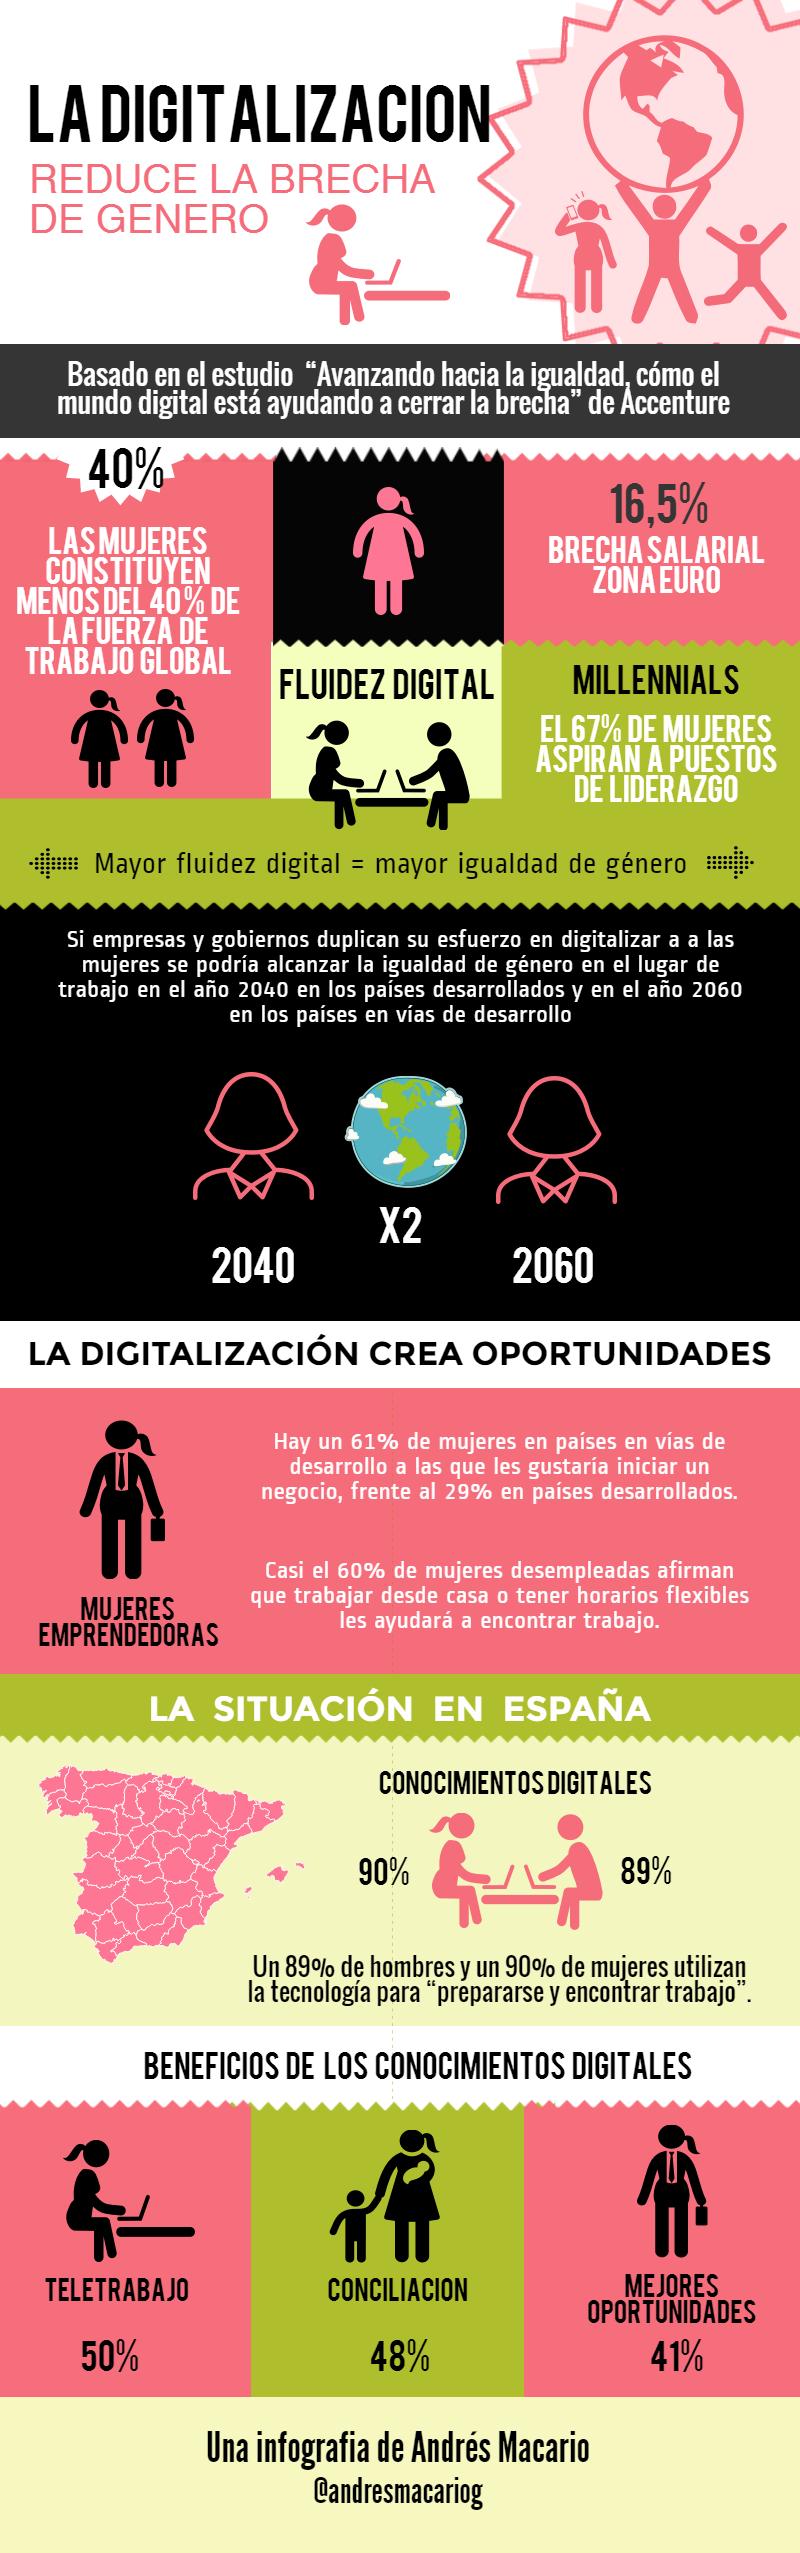 Digitalizacion reduce brecha de genero Infografia Andres Macario